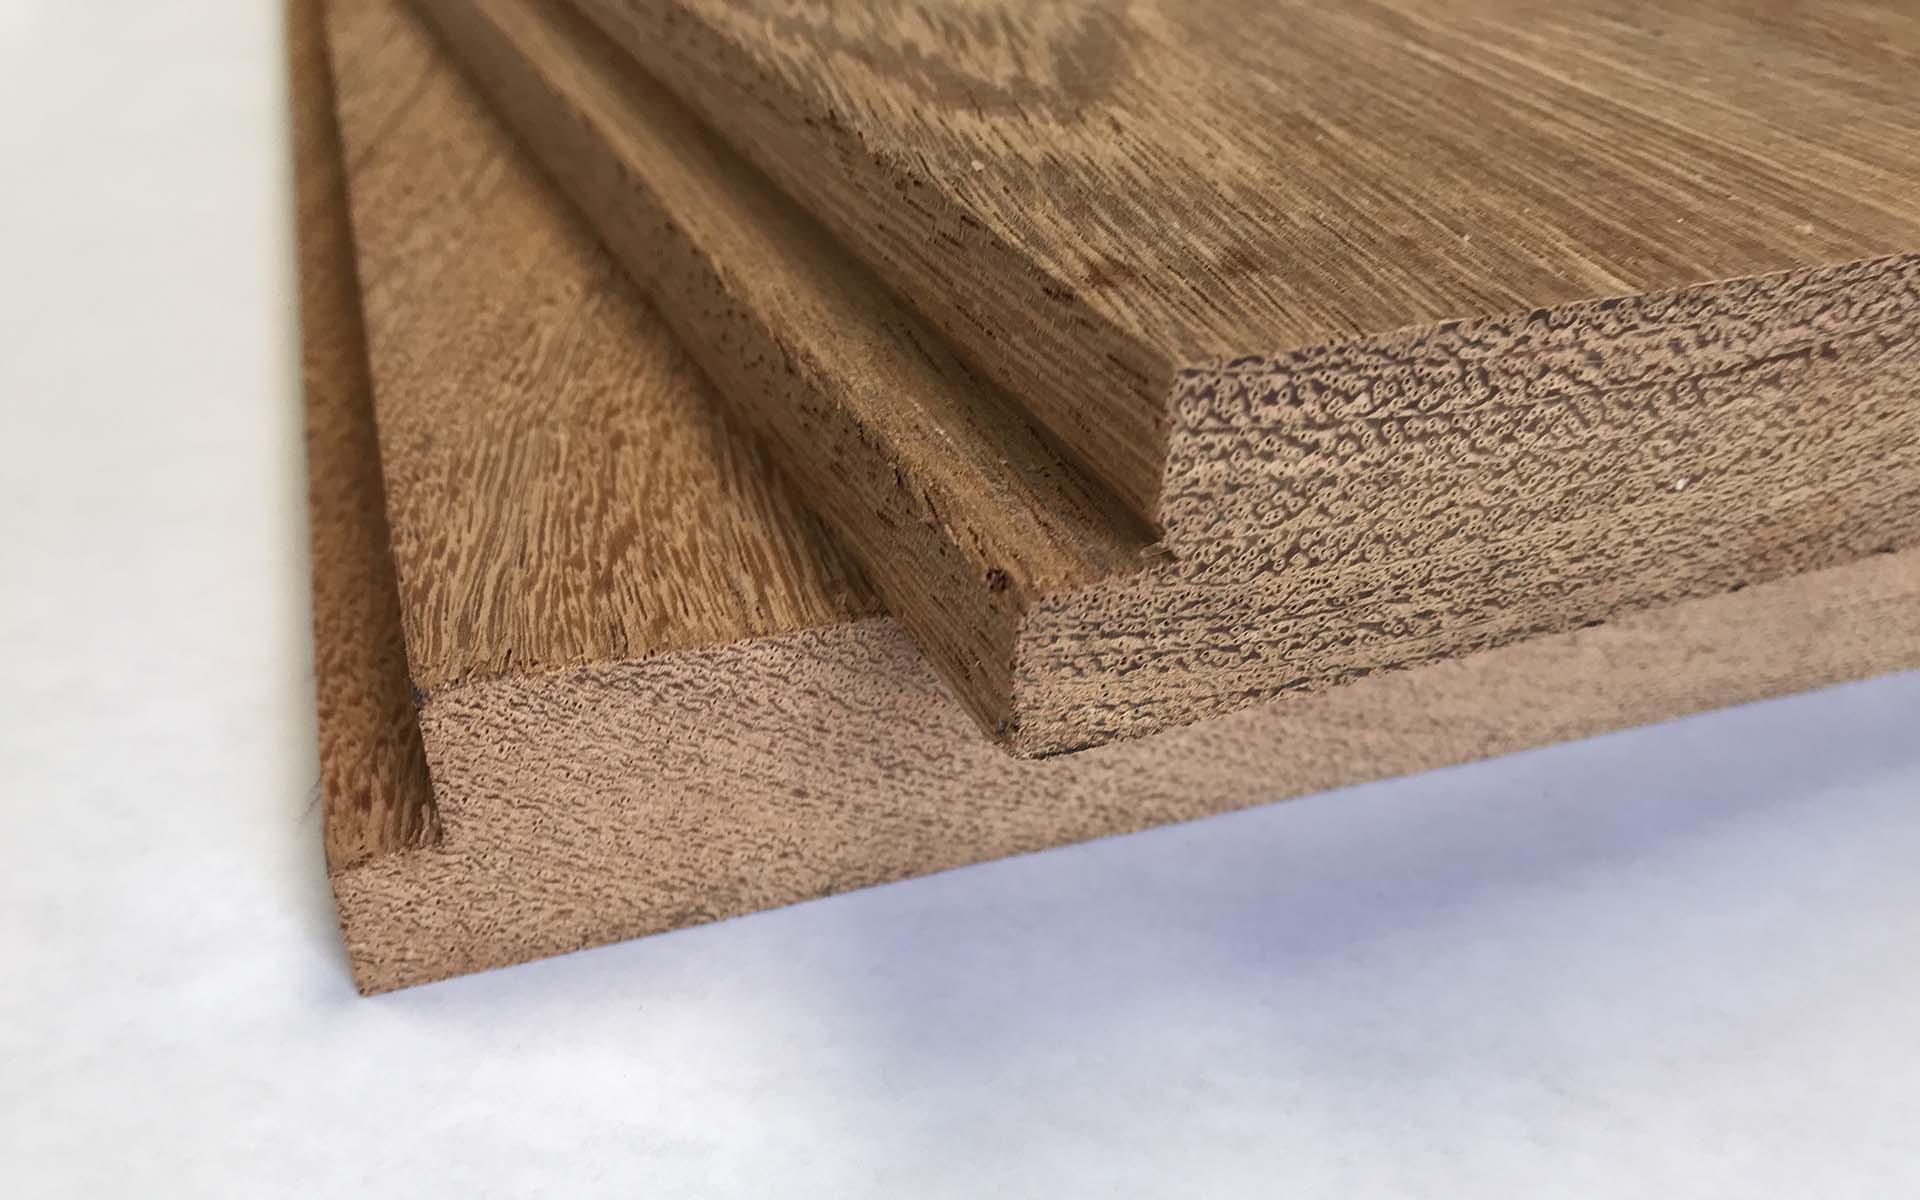 northern mills hardwood flooring inc of buy trailer decking apitong shiplap rough boards truck flooring intended for 3 angelim pedra shiplap close up